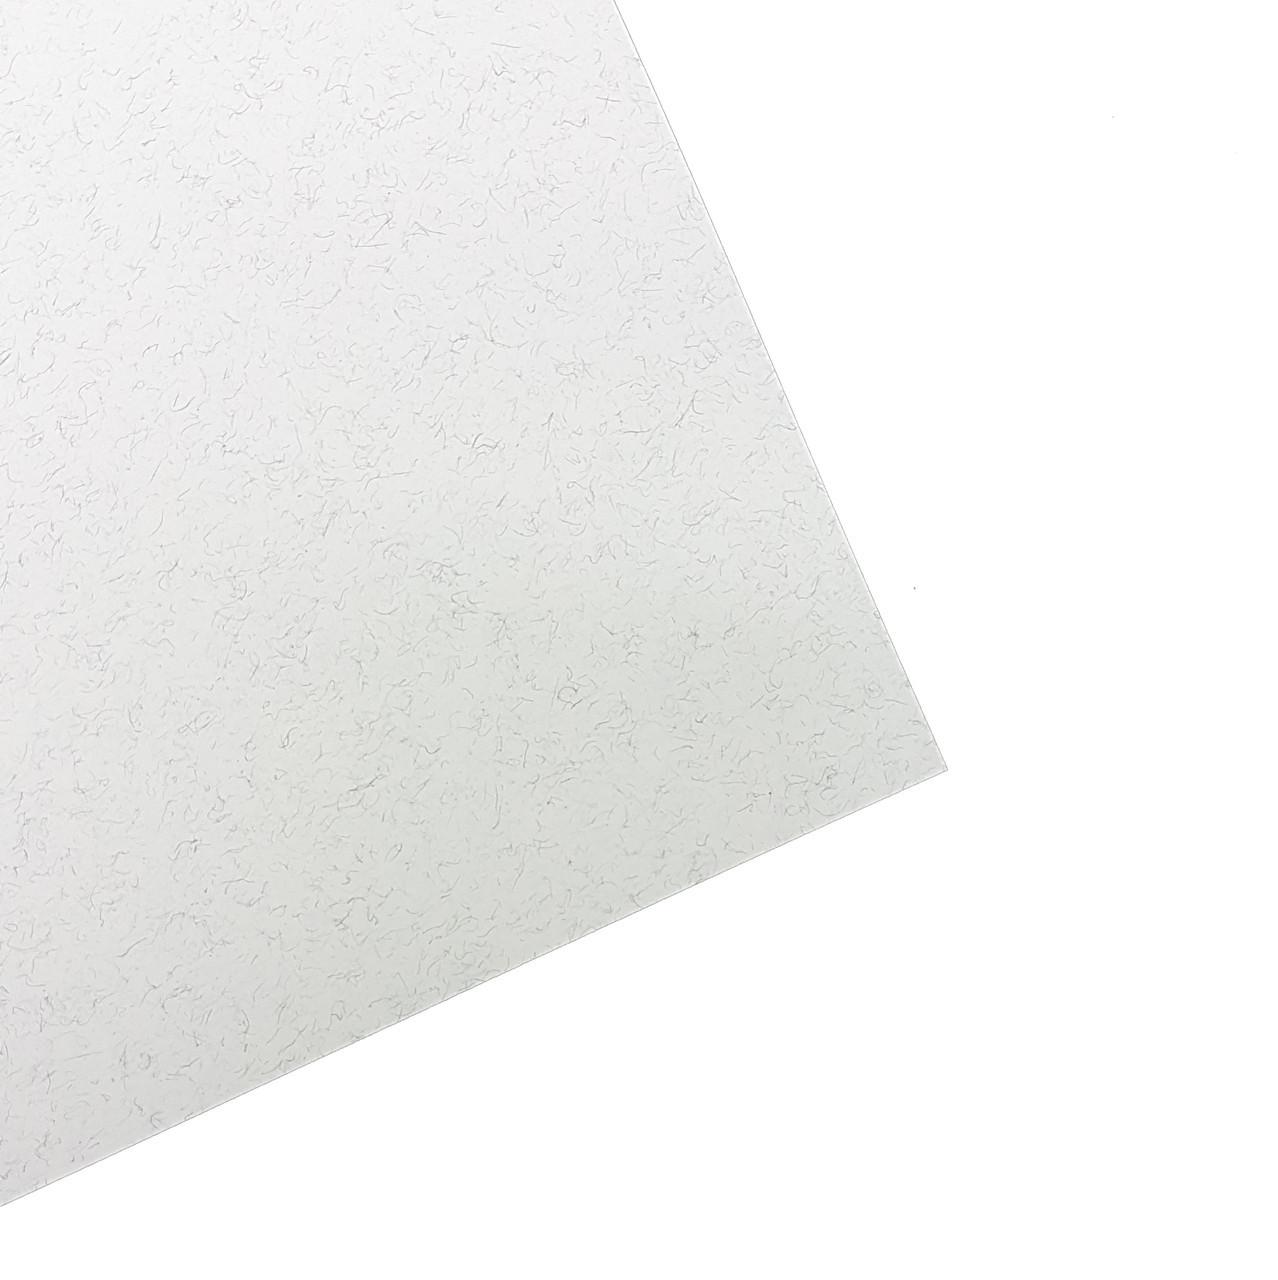 Картон белый с волокнами 220 г/м2 А4